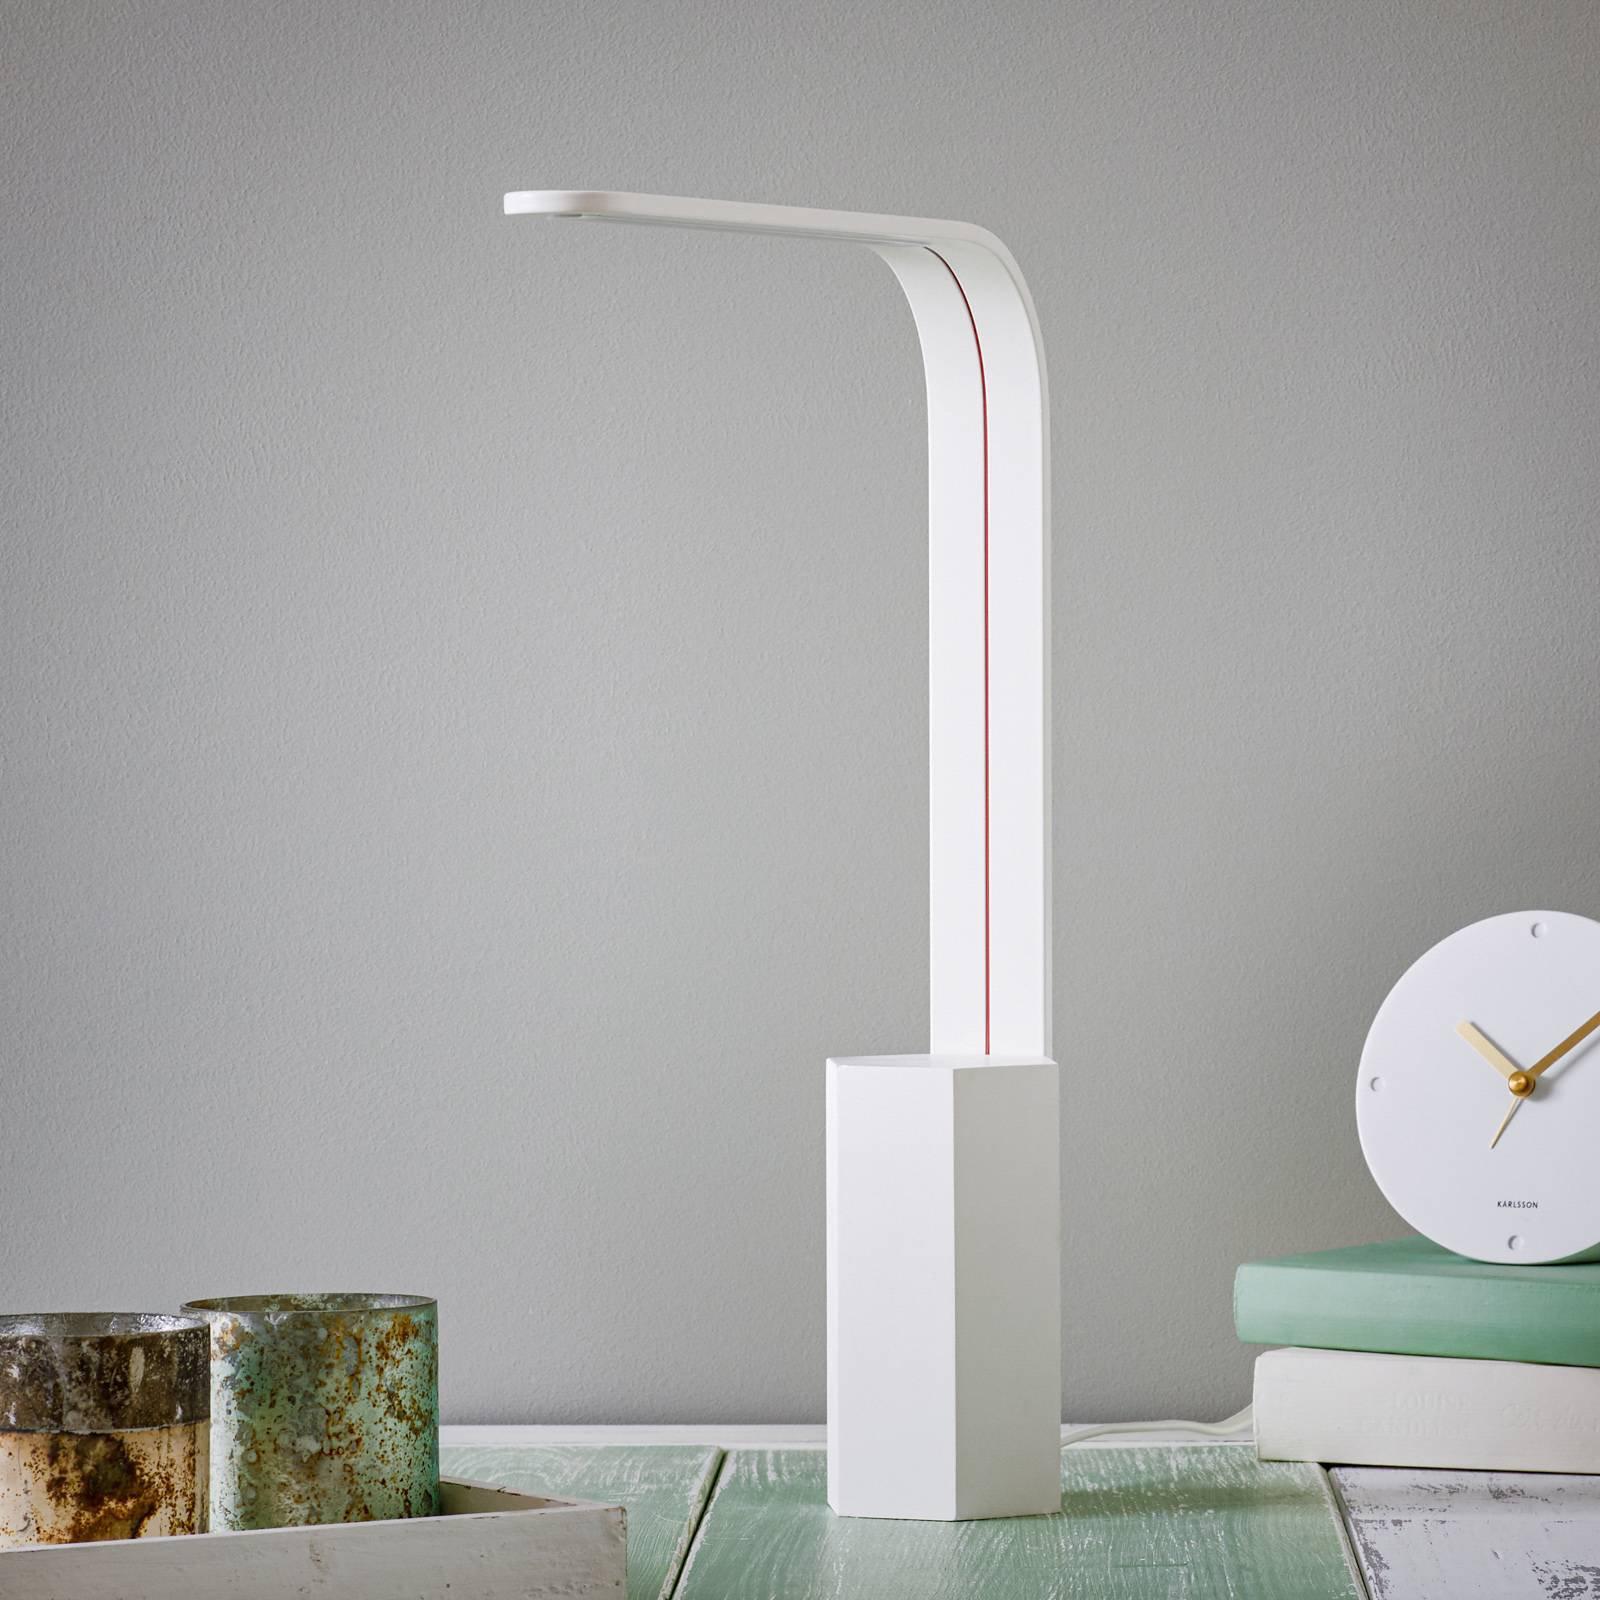 Design-LED-bordlampe 5291, 2 700 K